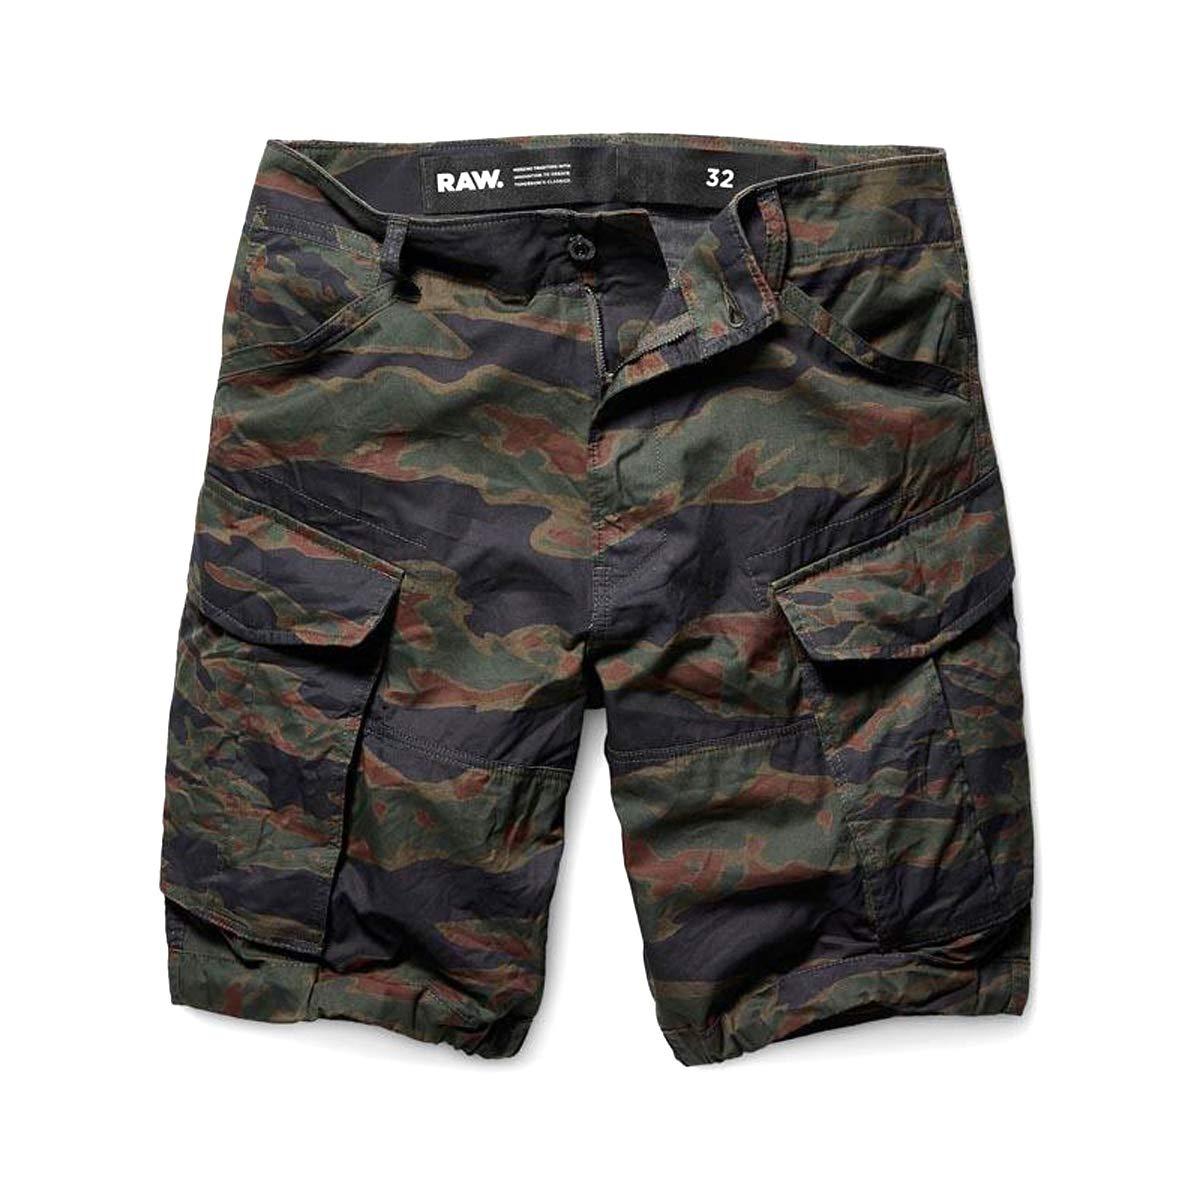 G-Star Raw Rovic PM Relaxed 1/2 Length Shorts Men | Smoke Green/Dark Vermont Green AOP (D09778-A572-9608)